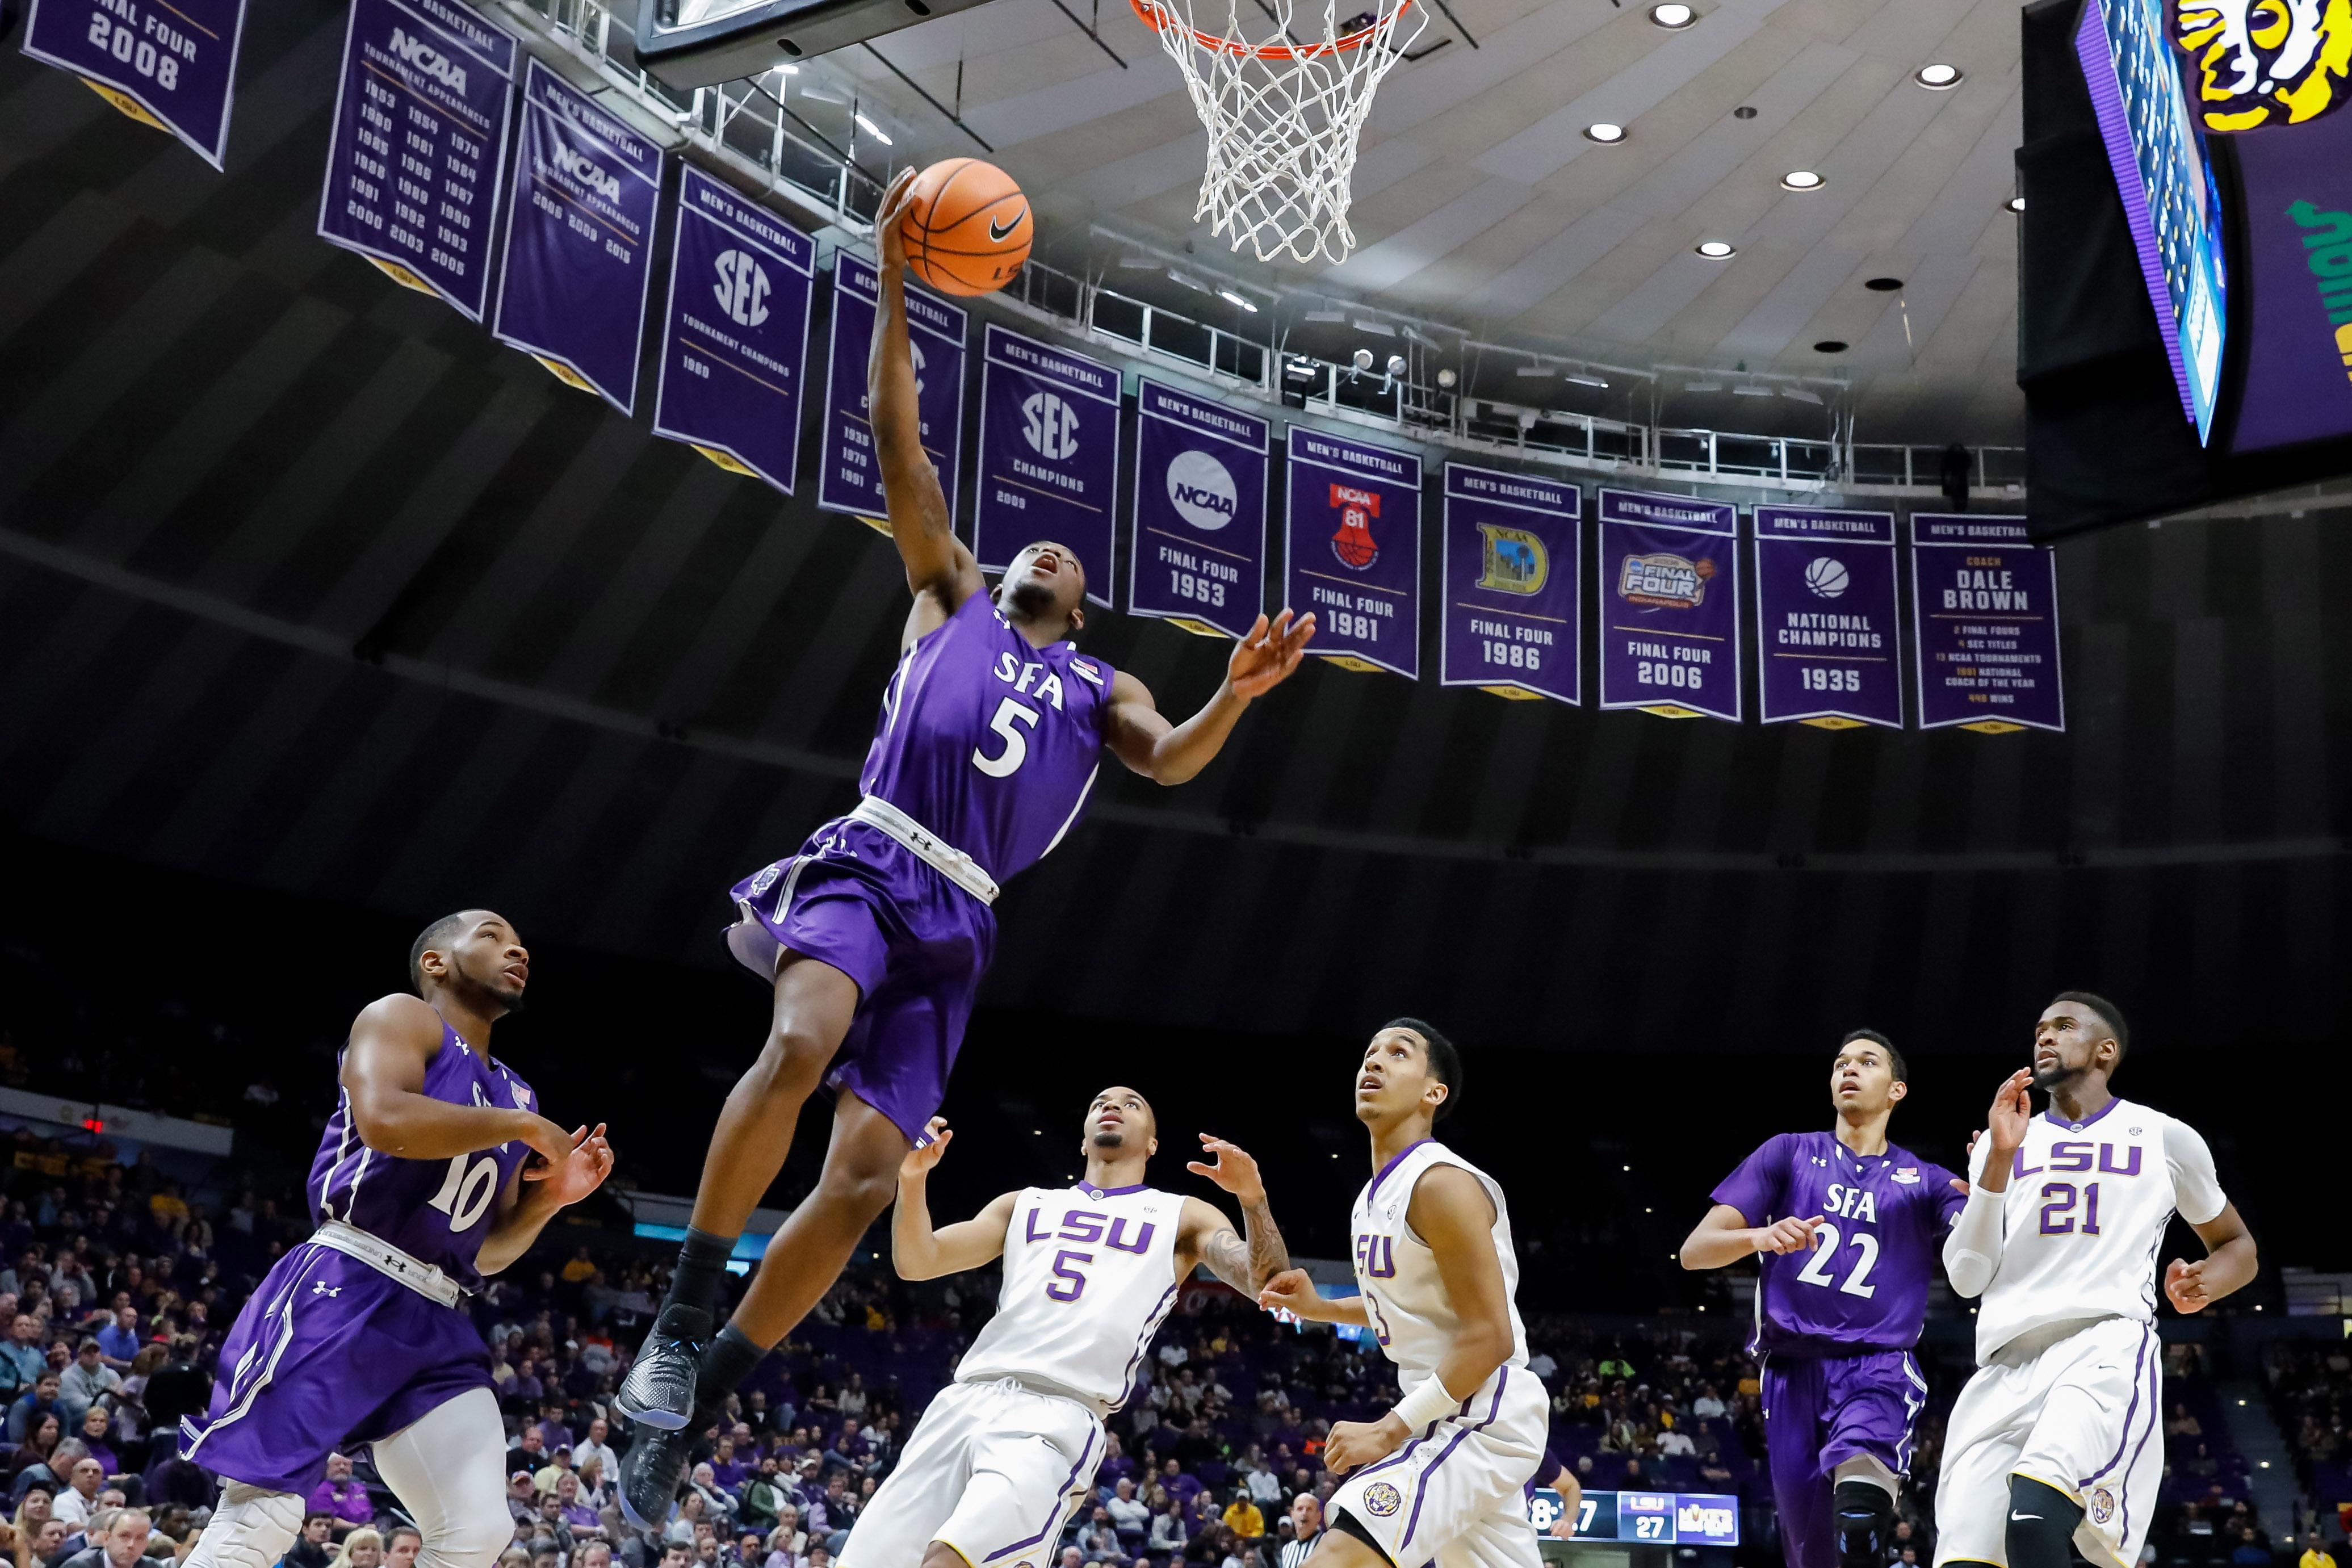 NCAA Basketball: Stephen F. Austin at Louisiana State